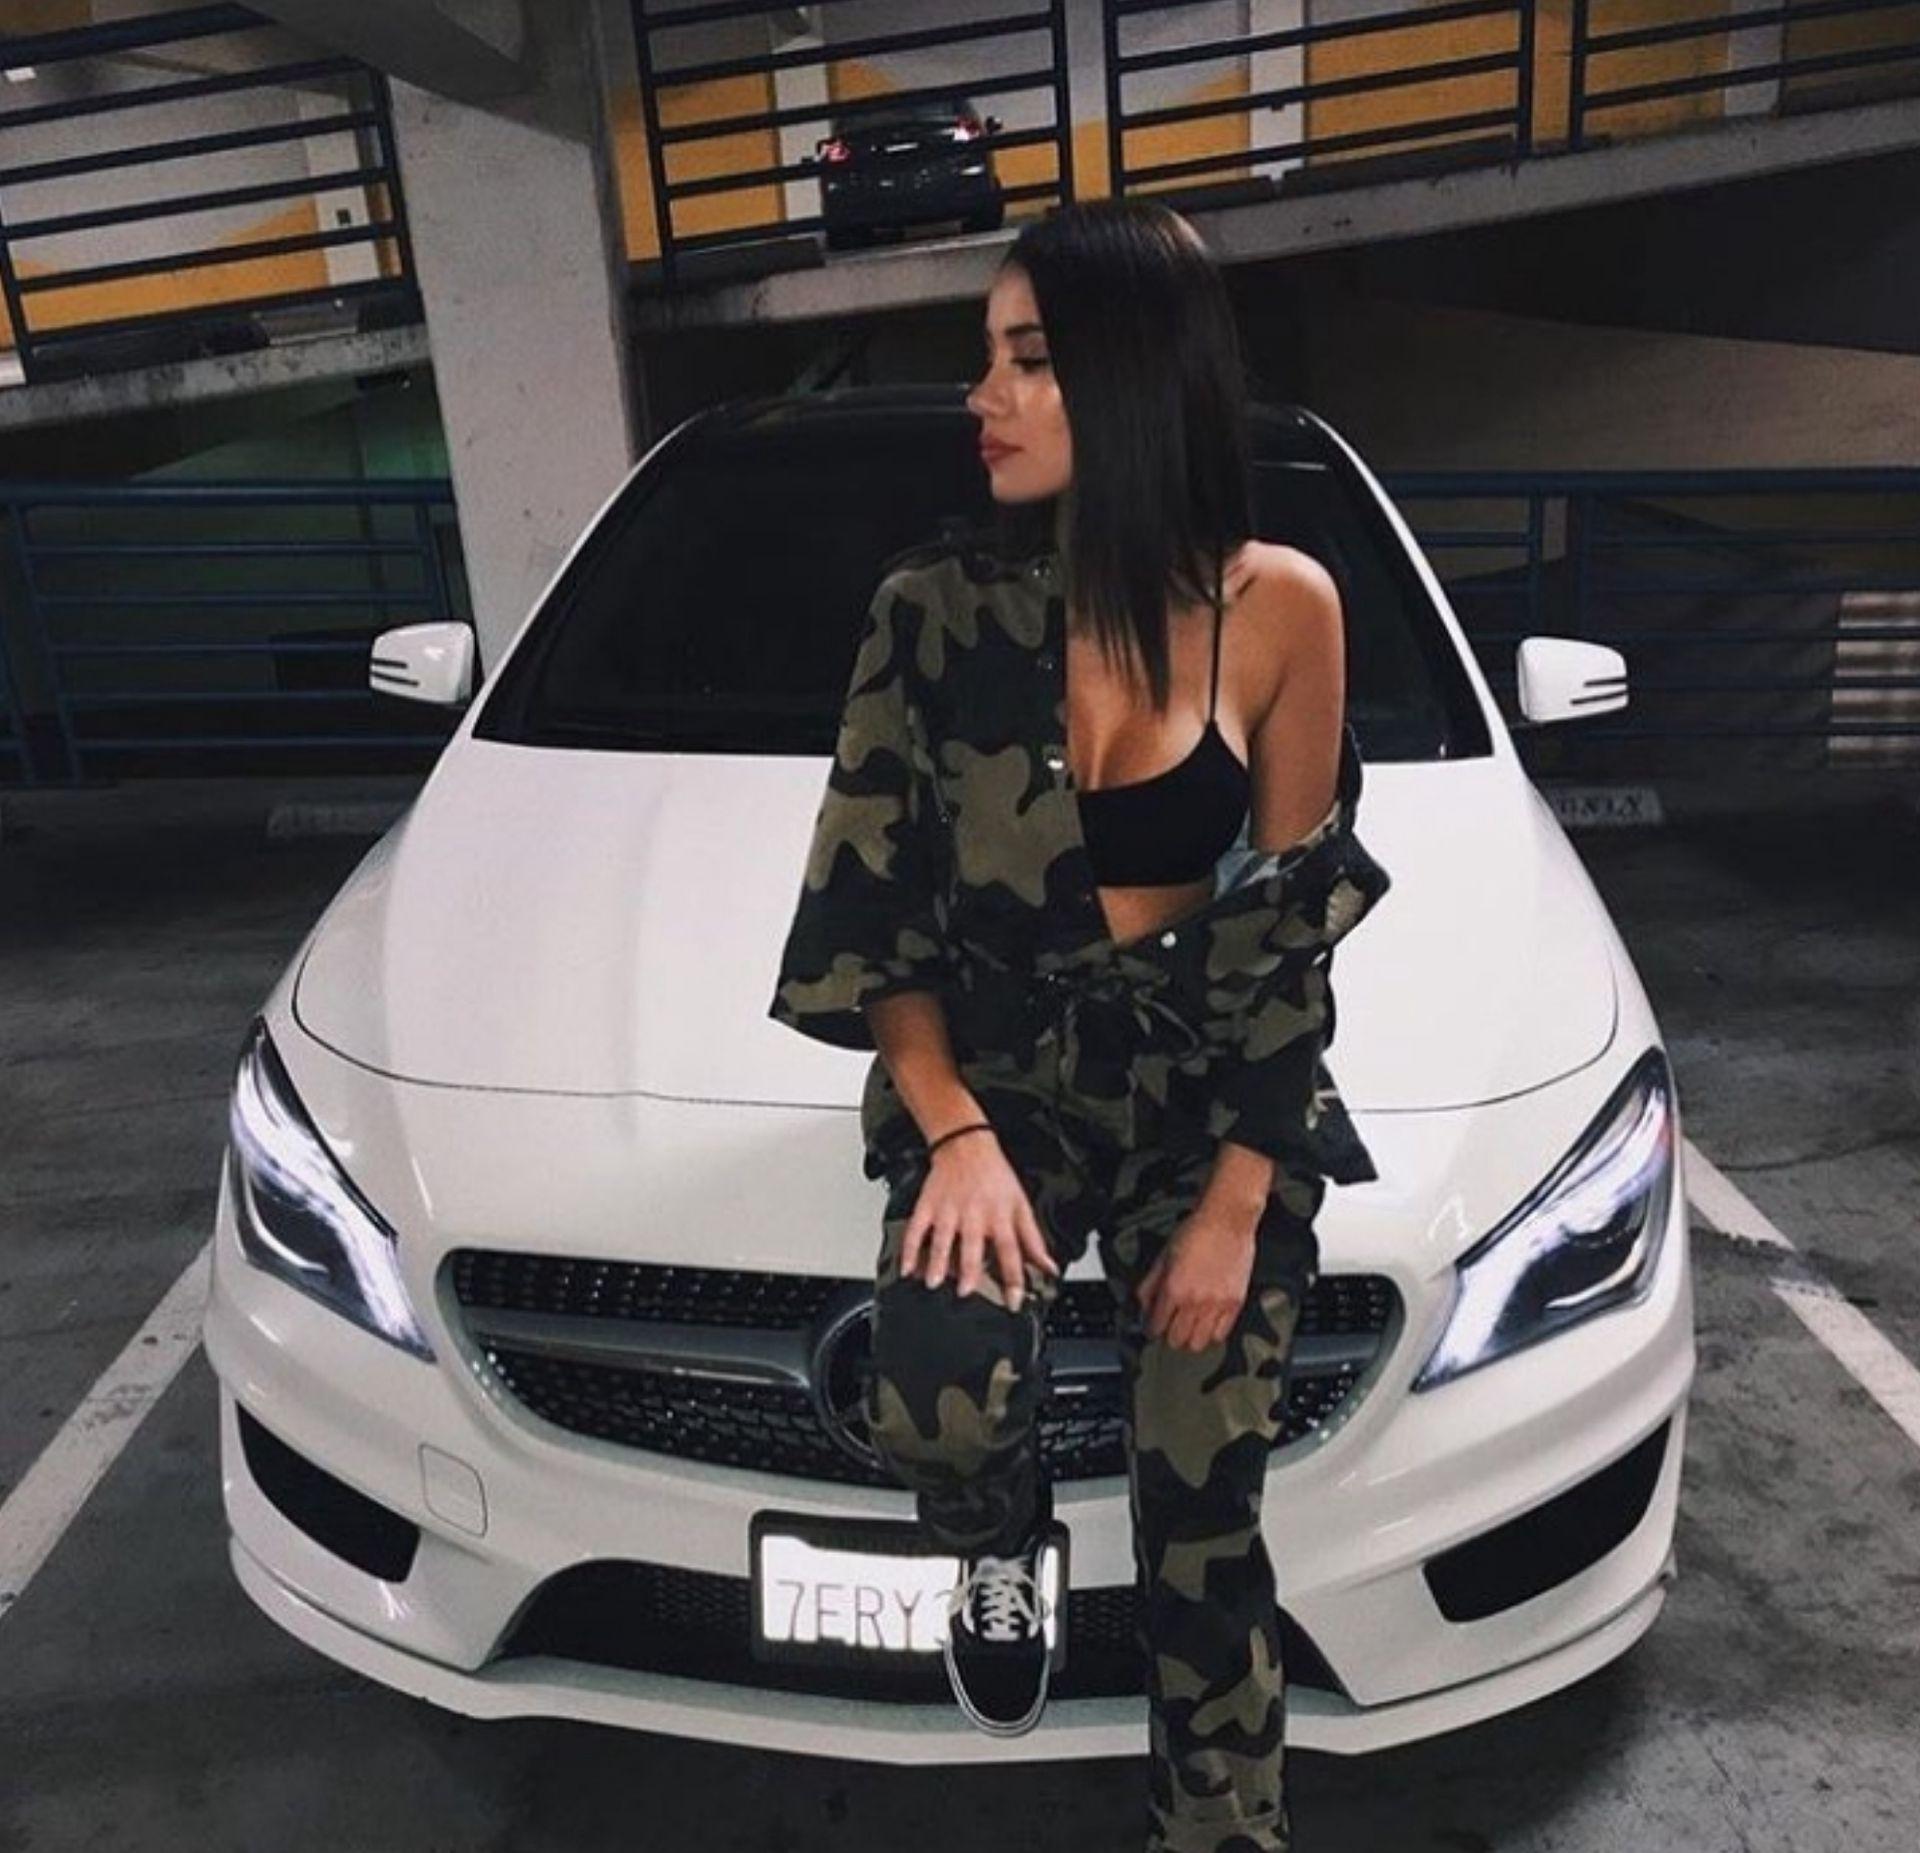 D I A B L A Ecko Con Imagenes Chicas En Autos Chicas De